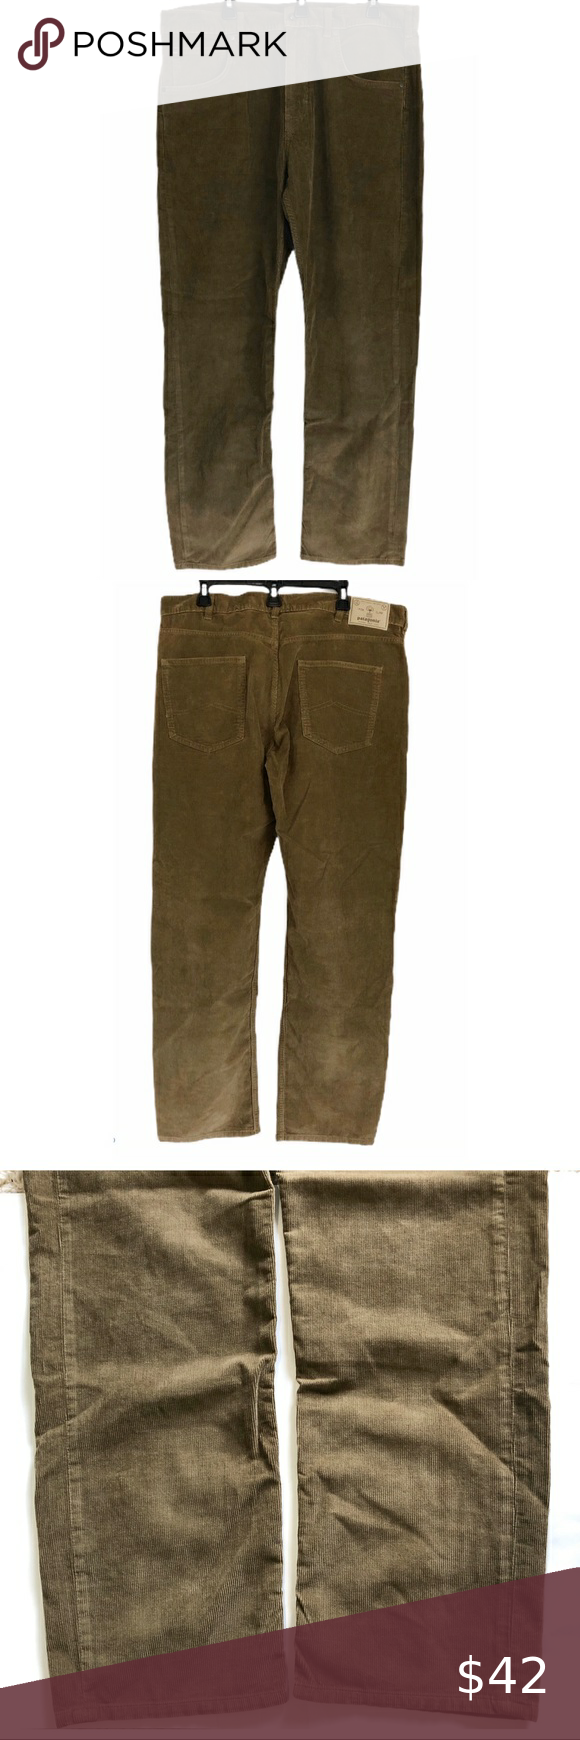 Sold Patagonia Iron Clad Corduroy Pants Corduroy Pants Patagonia Pants Pants